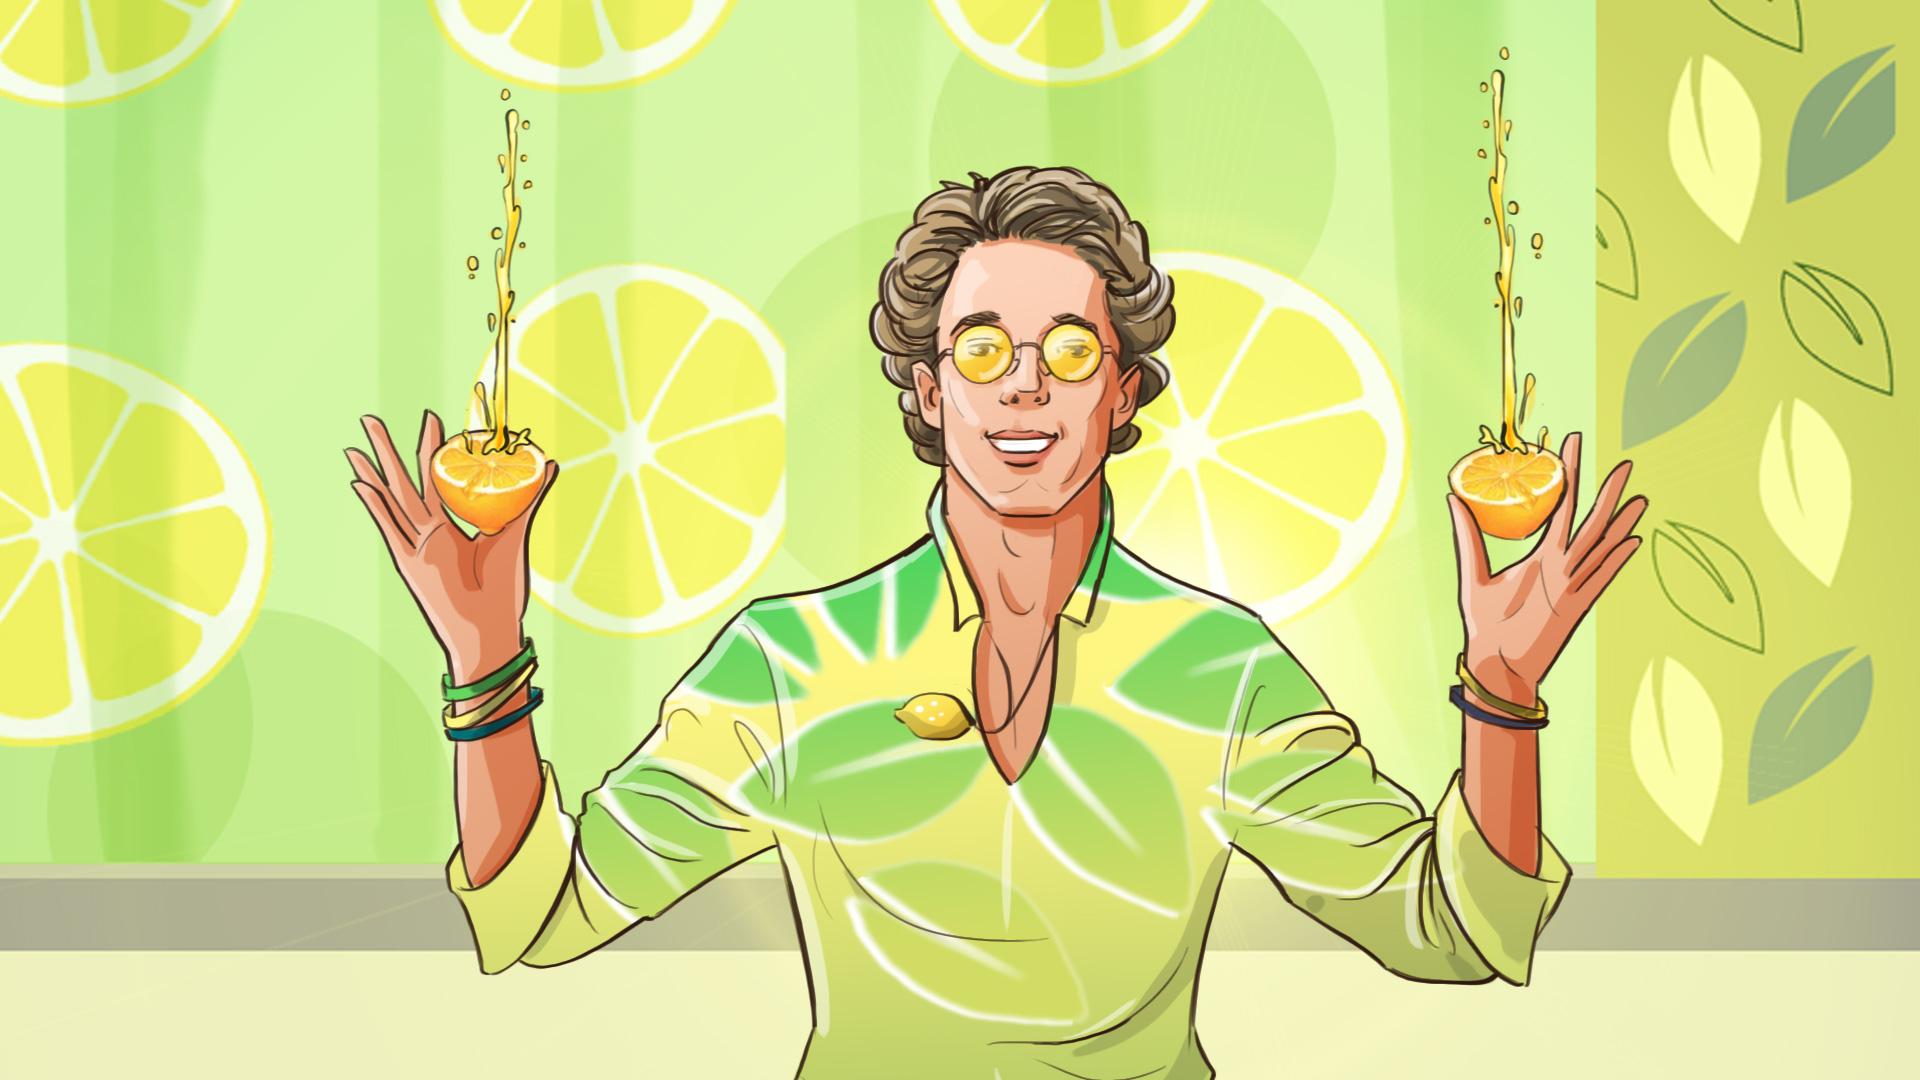 man lemon smile illustration advertising